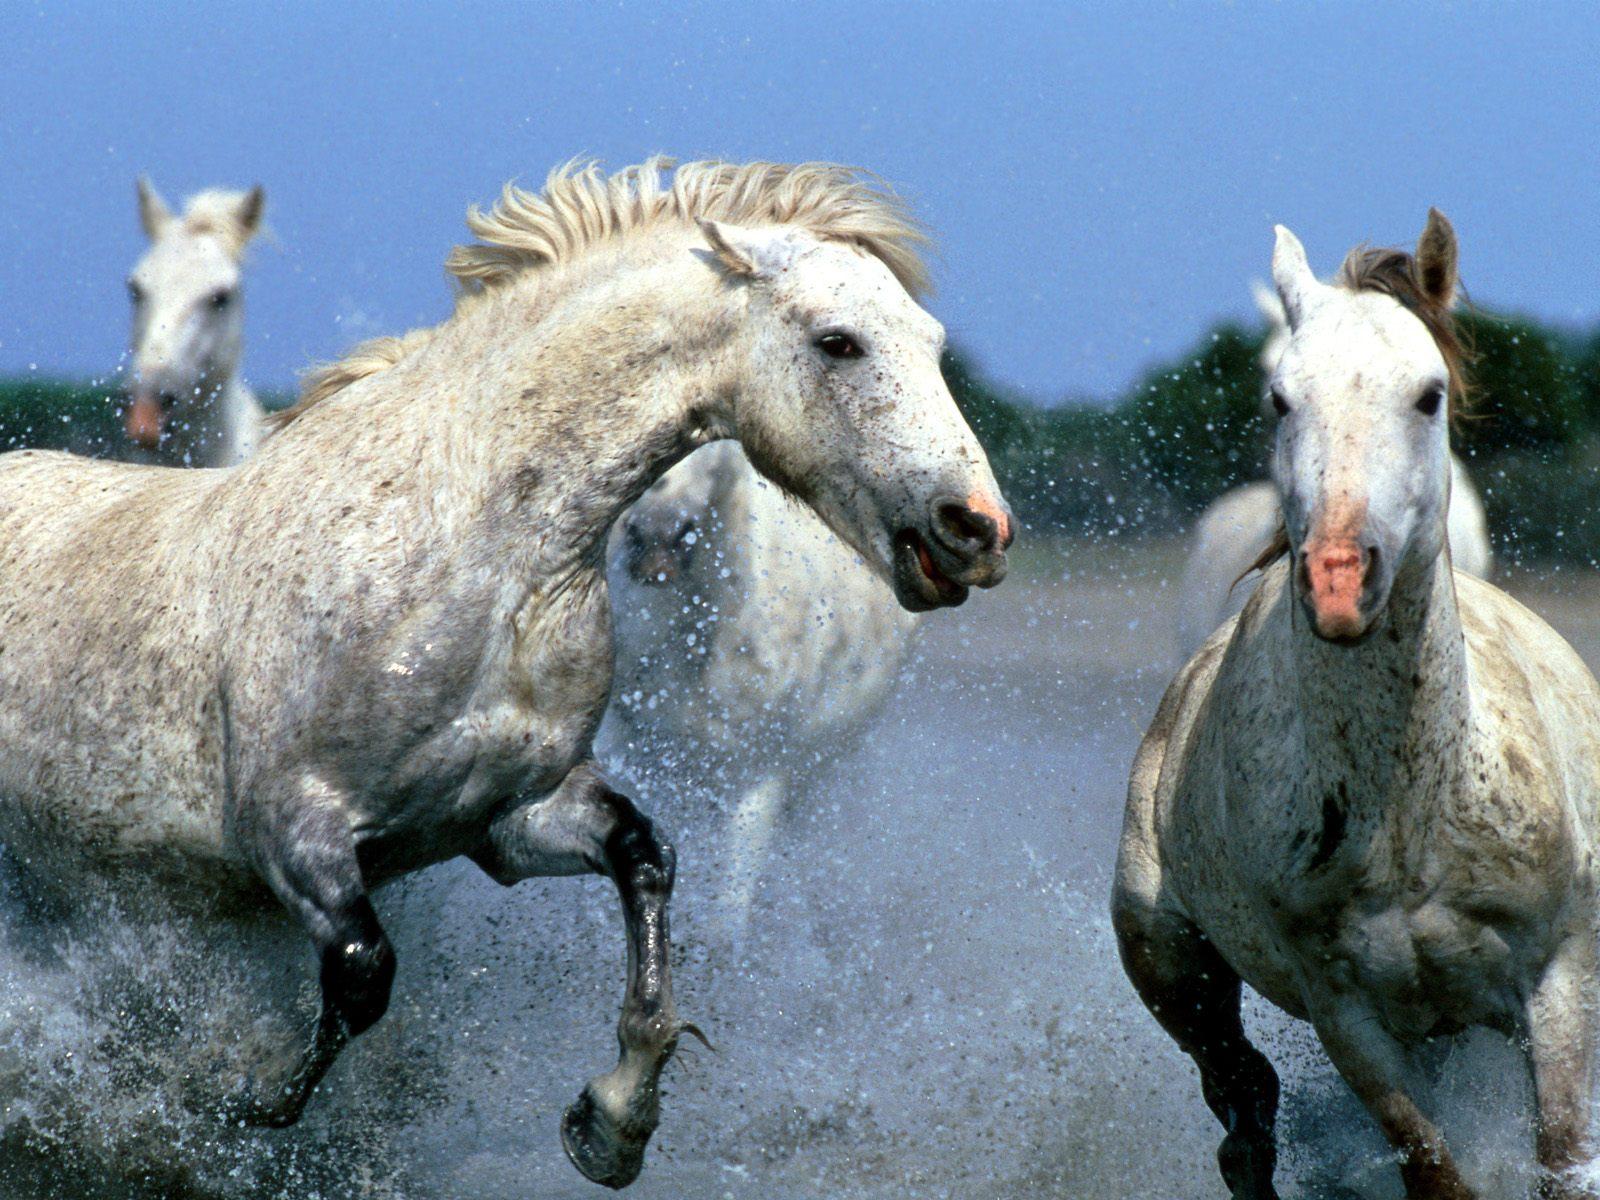 Horses Wallpapers for Desktop Backgrounds Wish you enjoy it 1600x1200